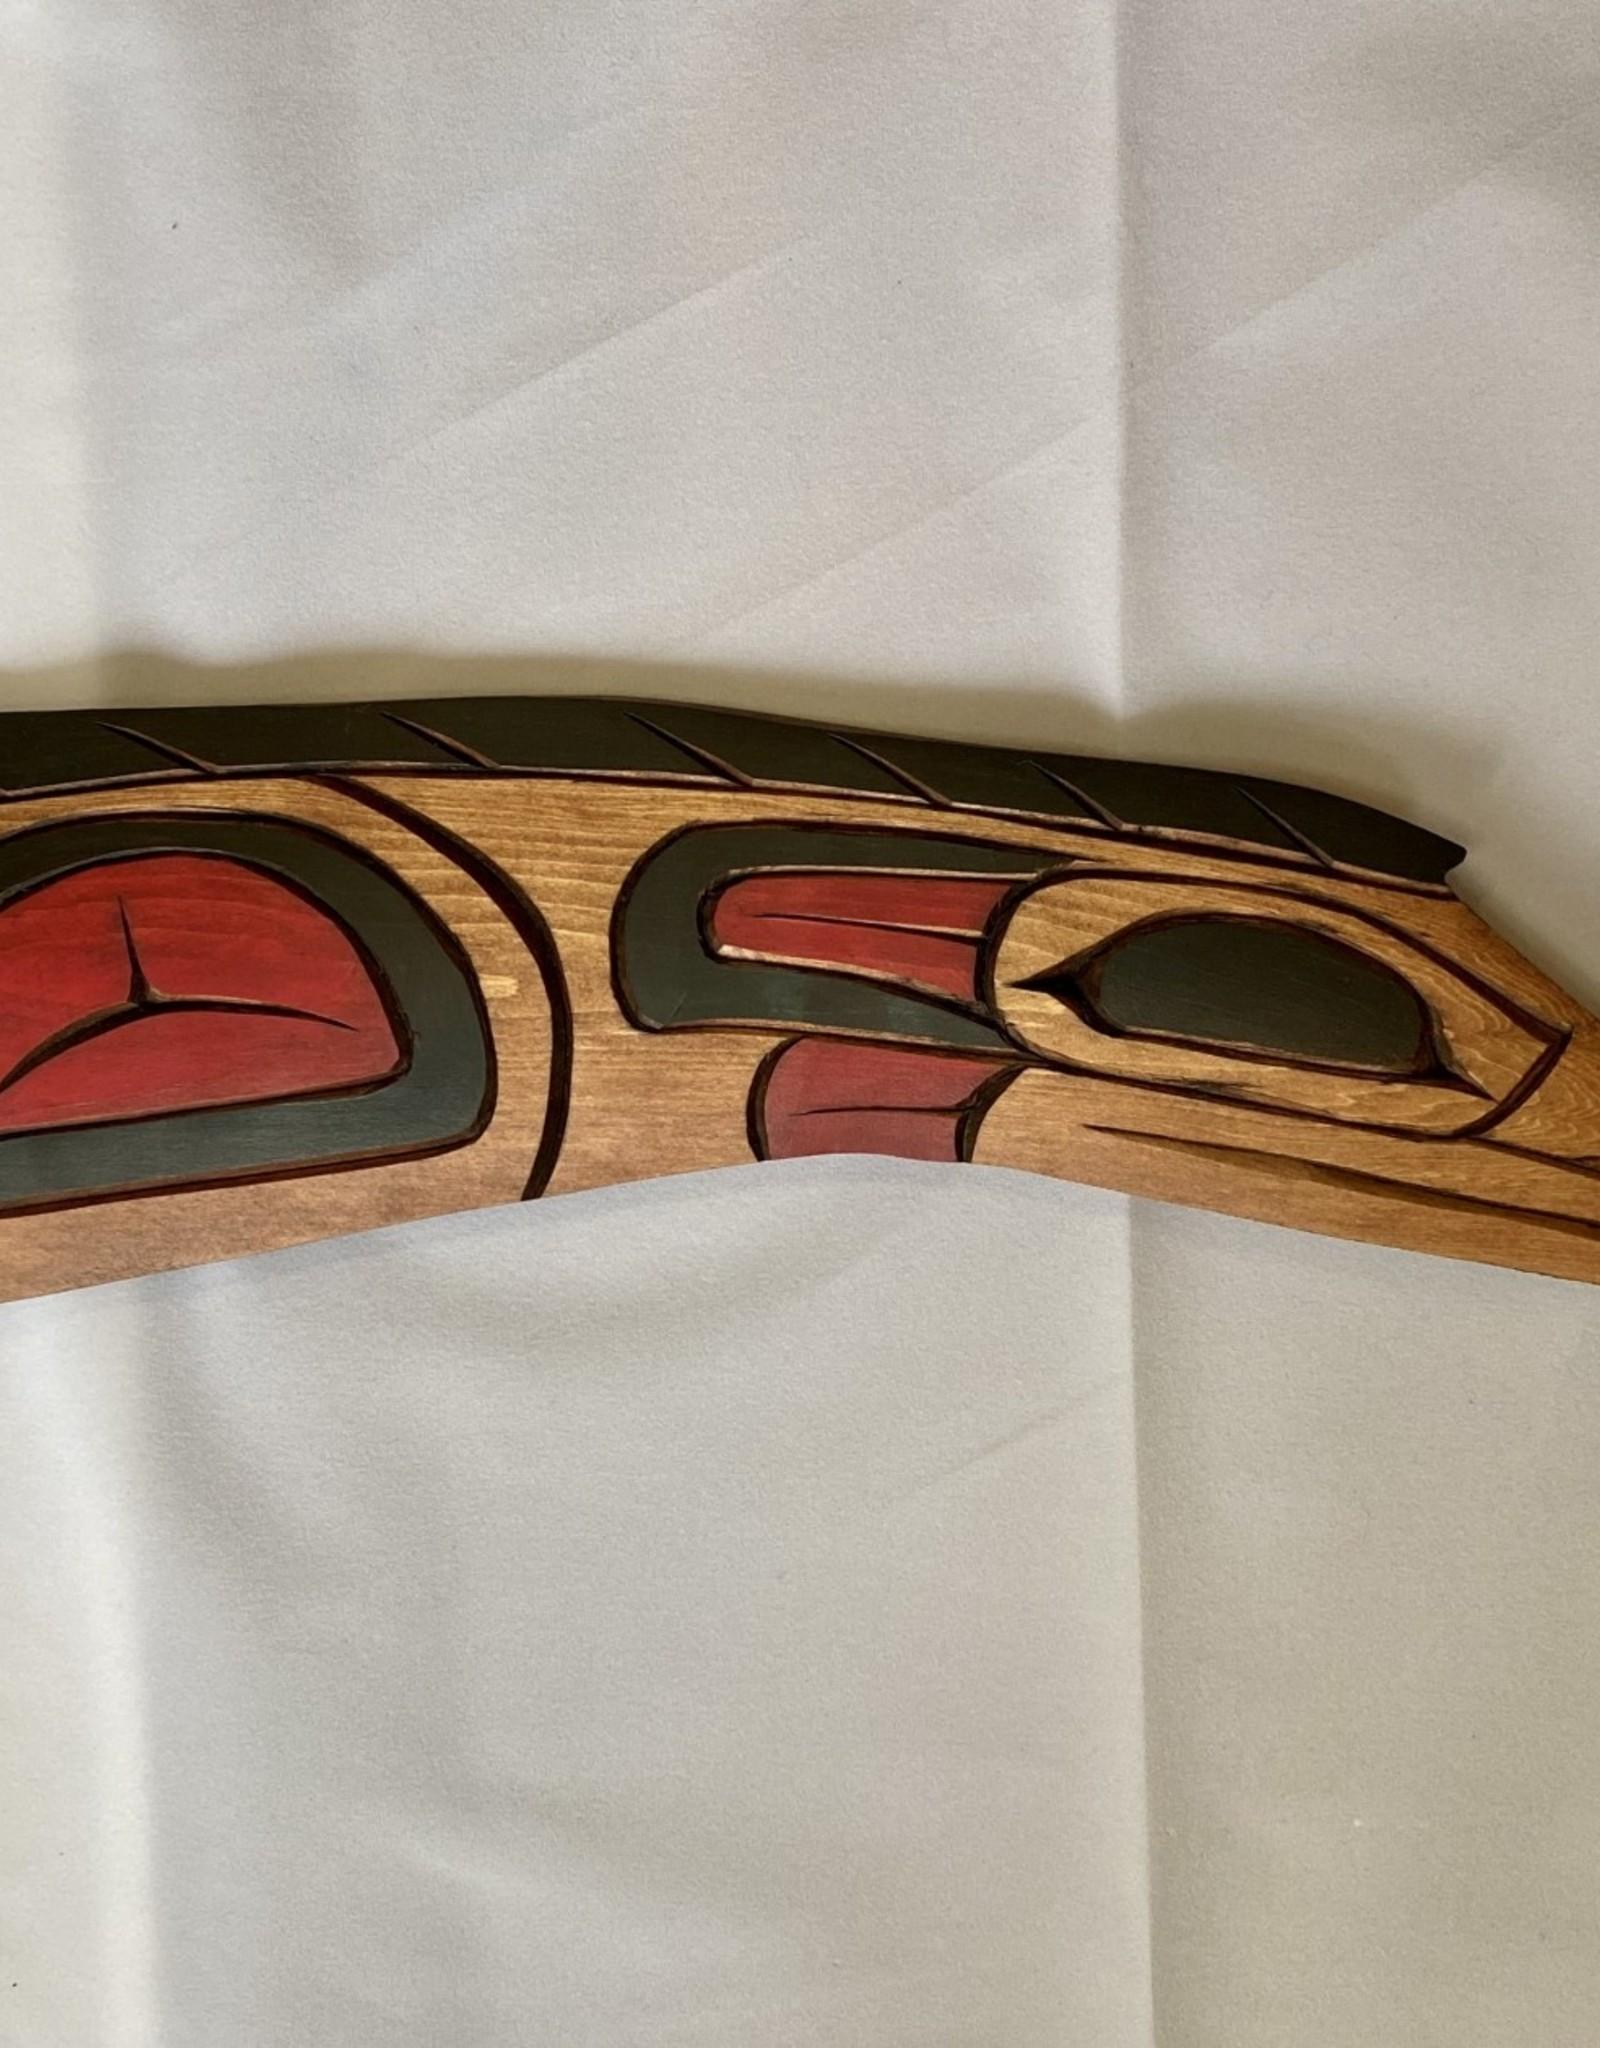 Aboriginal - Sisiutl or Serpent Carving